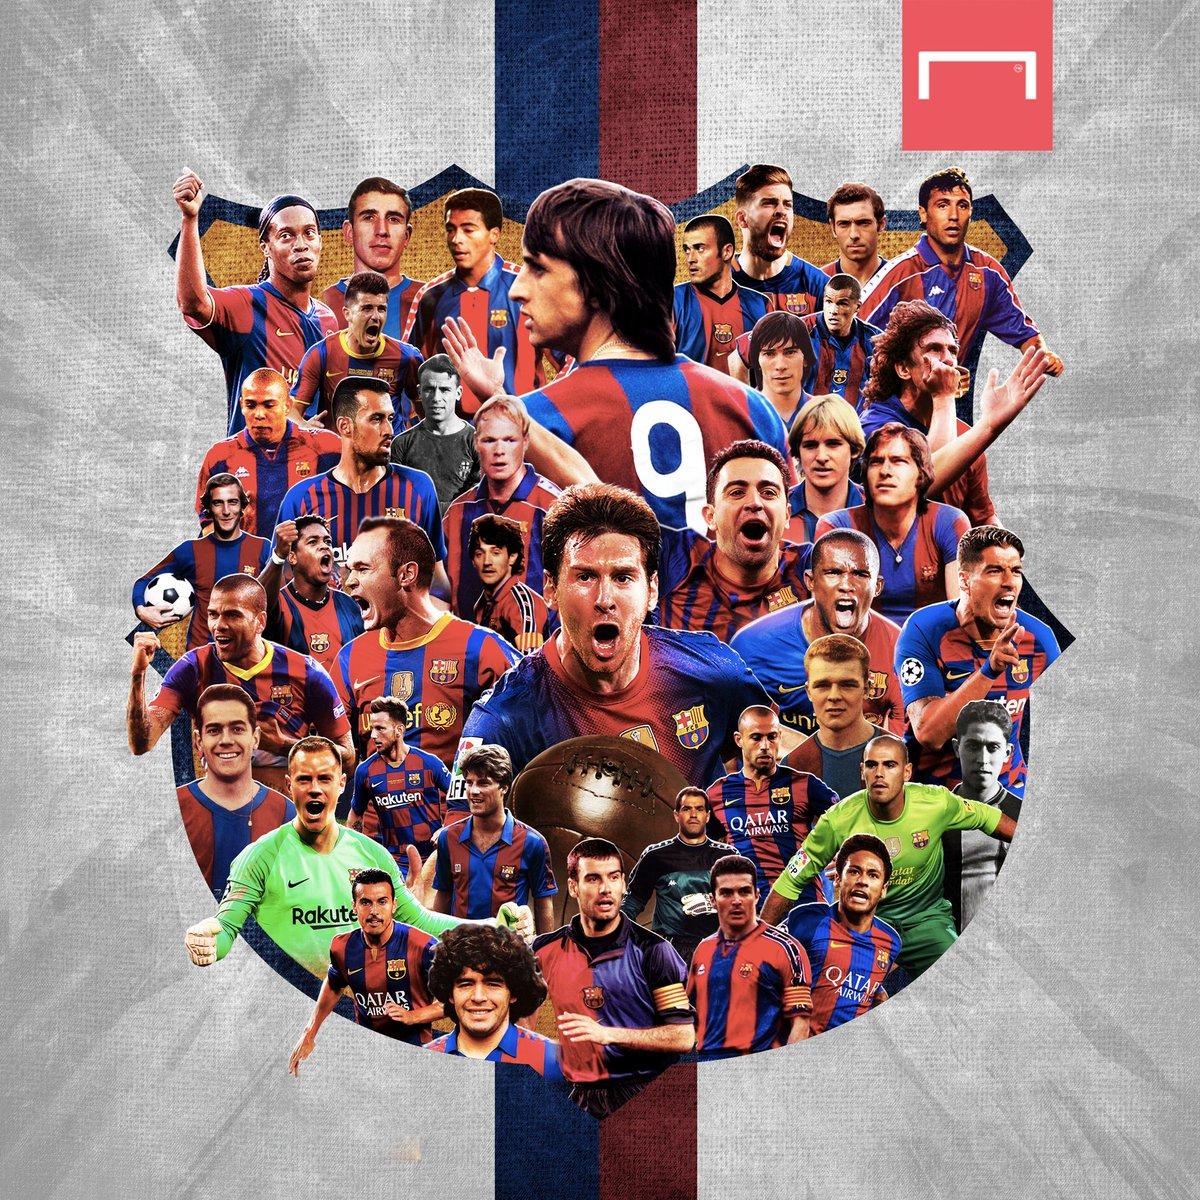 RT @Guardiolato: Esto de @goal es precioso 😍 https://t.co/IRiOnLO5dP